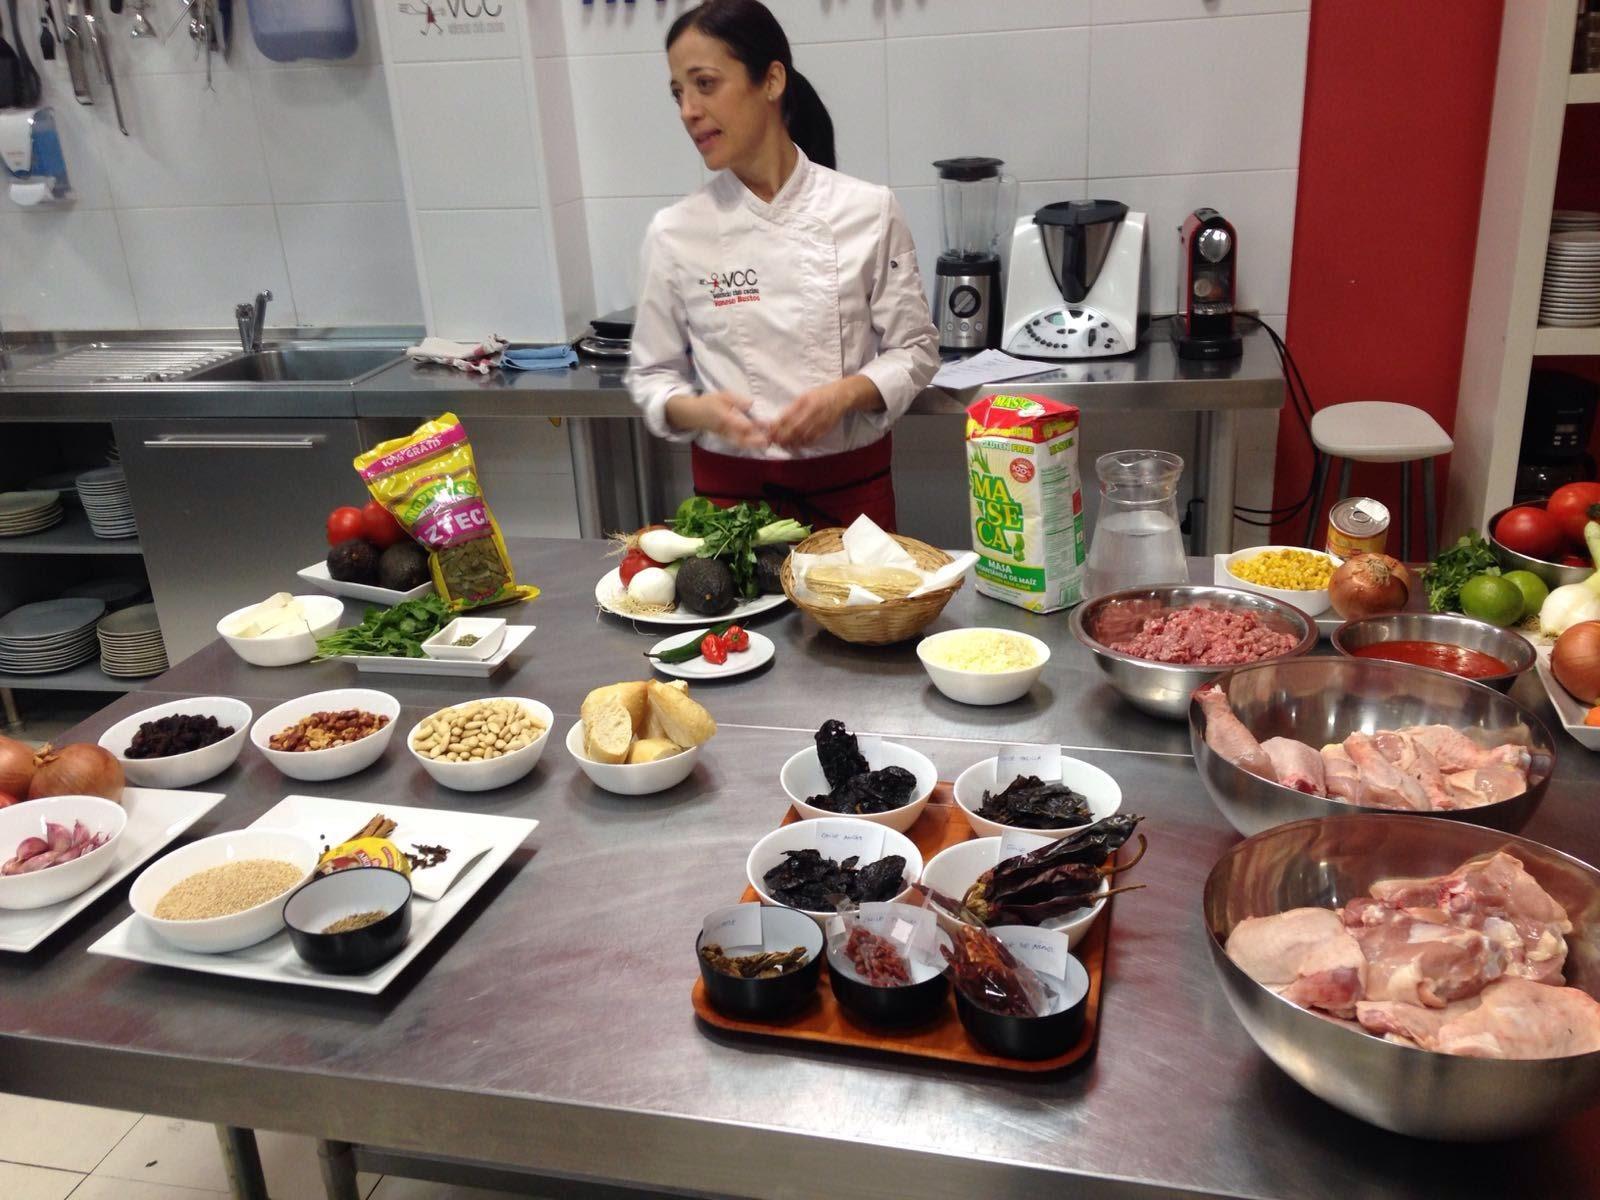 Bonito cursos de cocina en valencia galer a de im genes - Cursos de cocina en valencia gratis ...